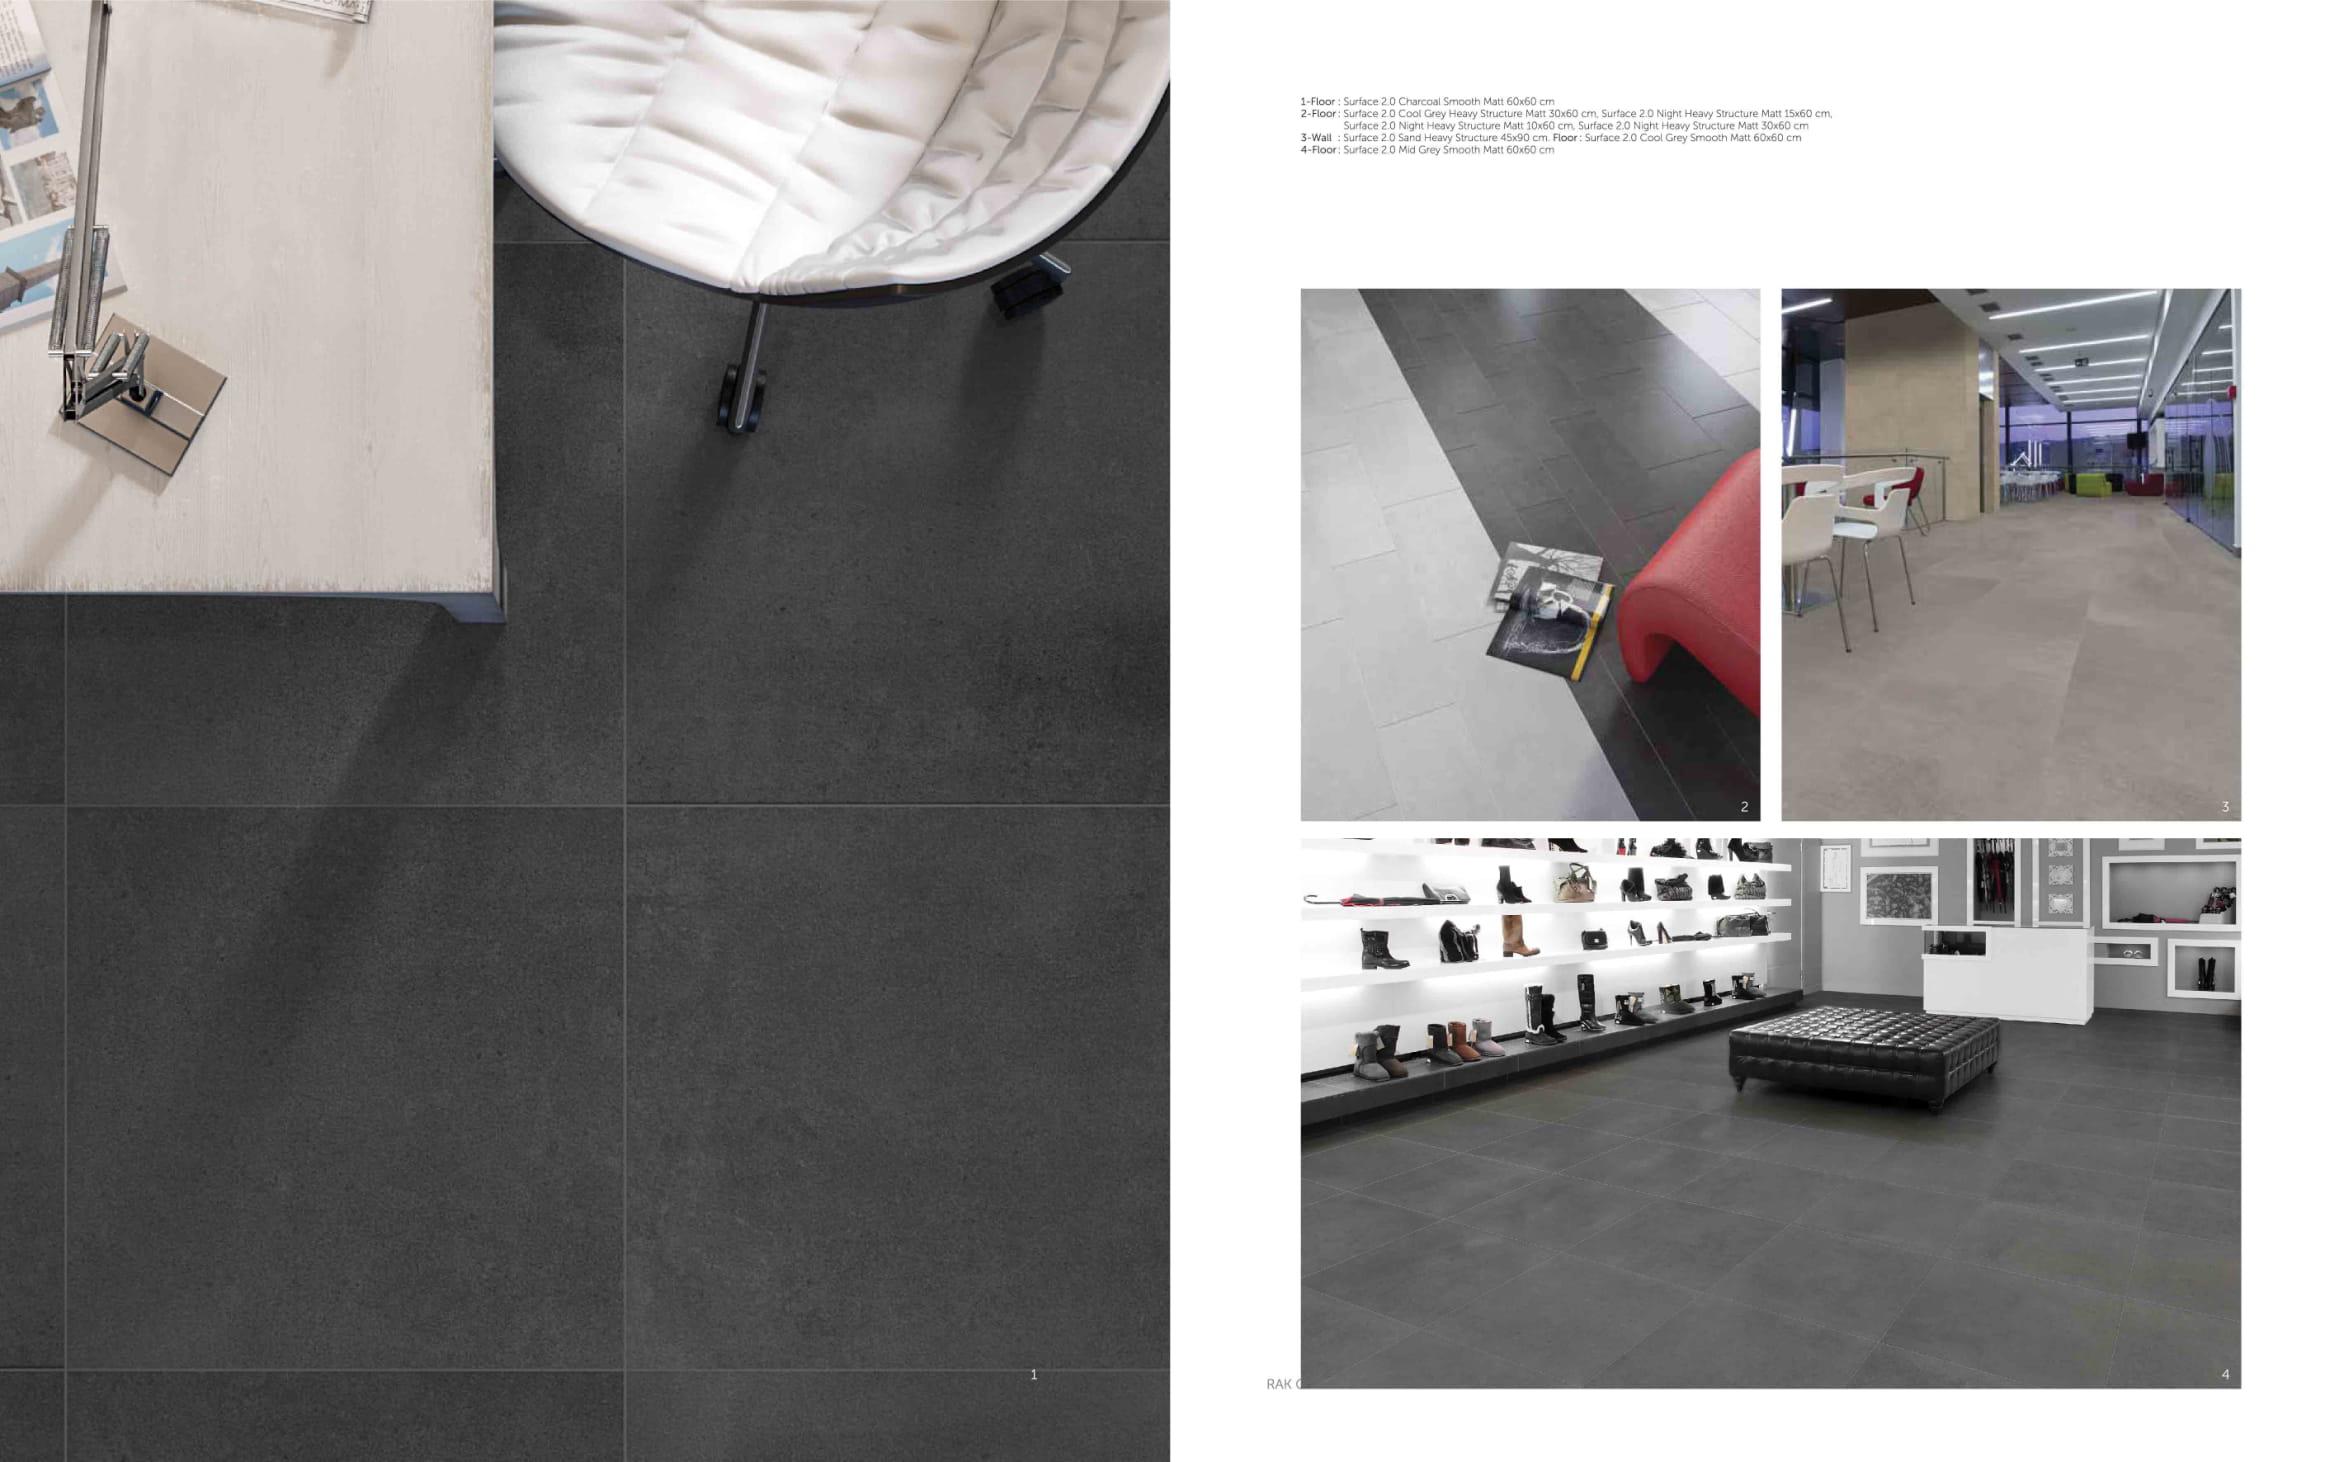 Surface 06 1 - سرامیک طوسی طرح بتن   60در120   پرسلان   سورفیس   طوسی تیره   مات